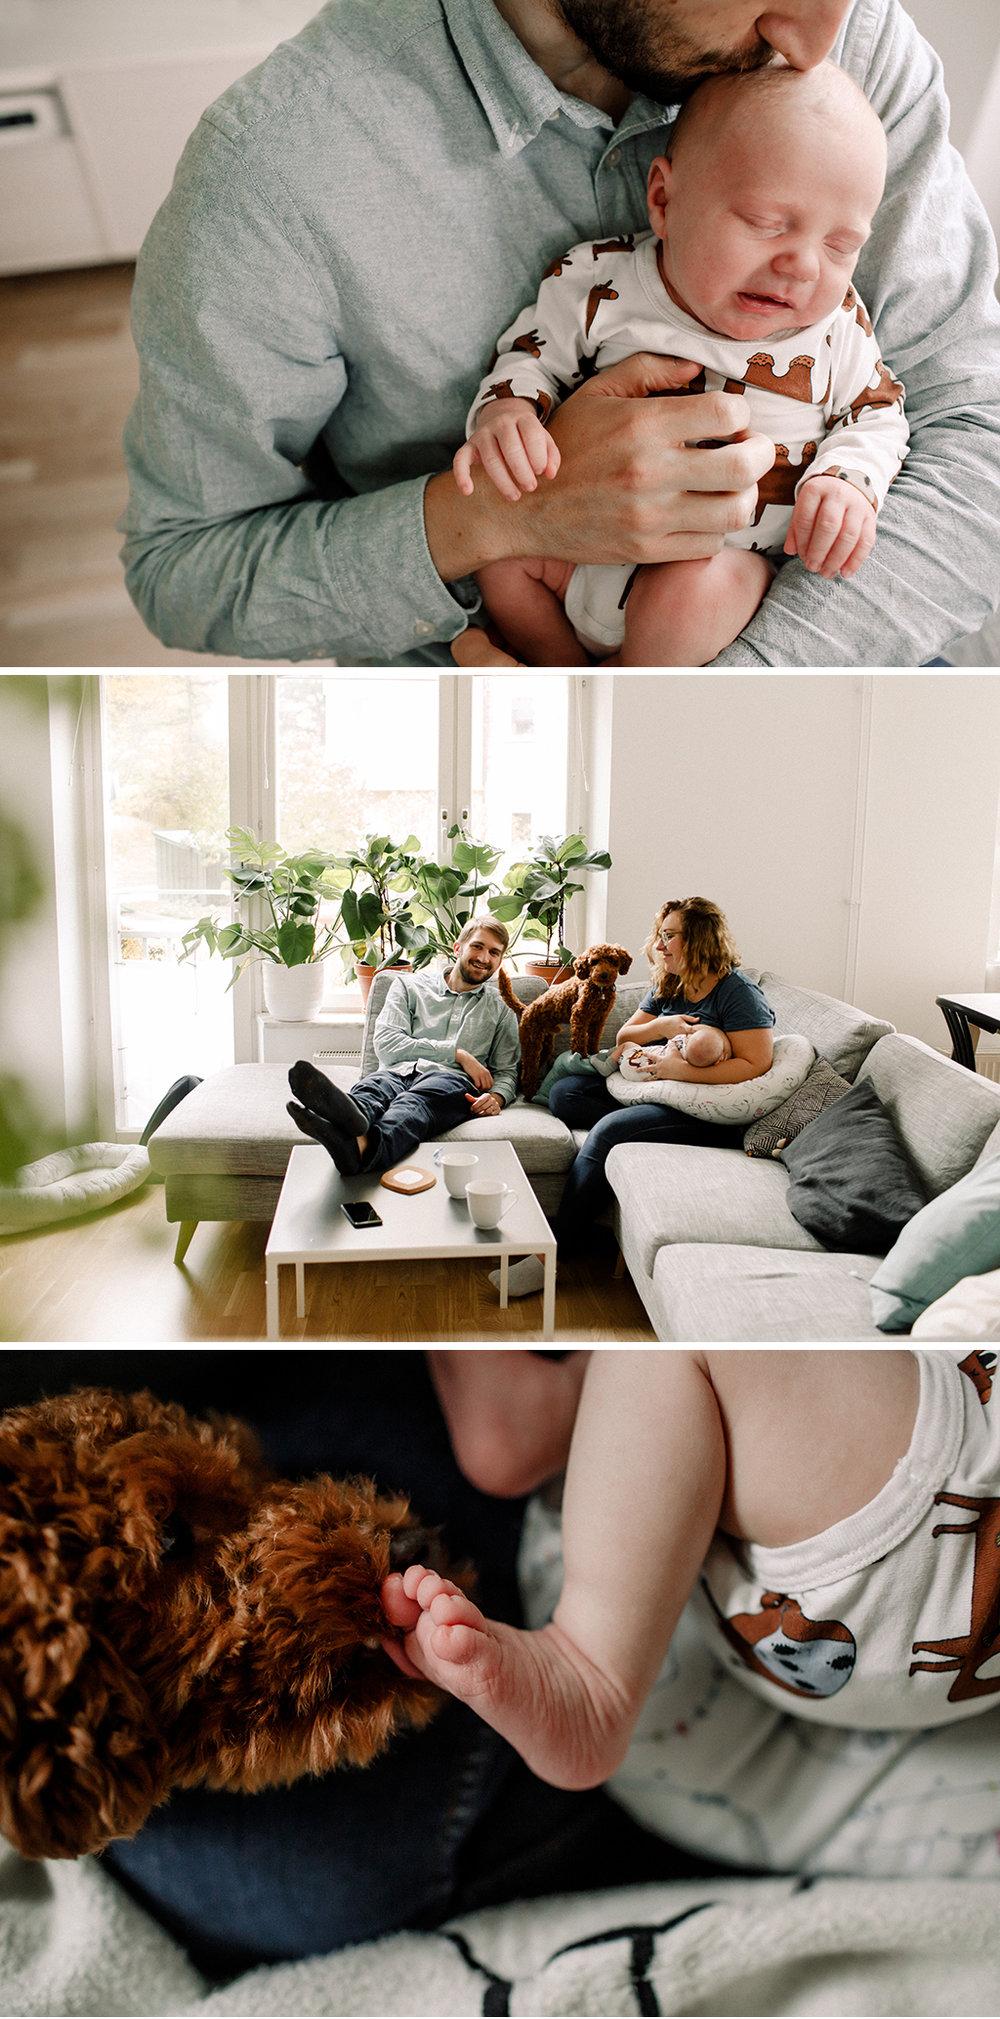 Newborn_Nyfoddfotografering_Stockholm_Familjefotograf_4.jpg